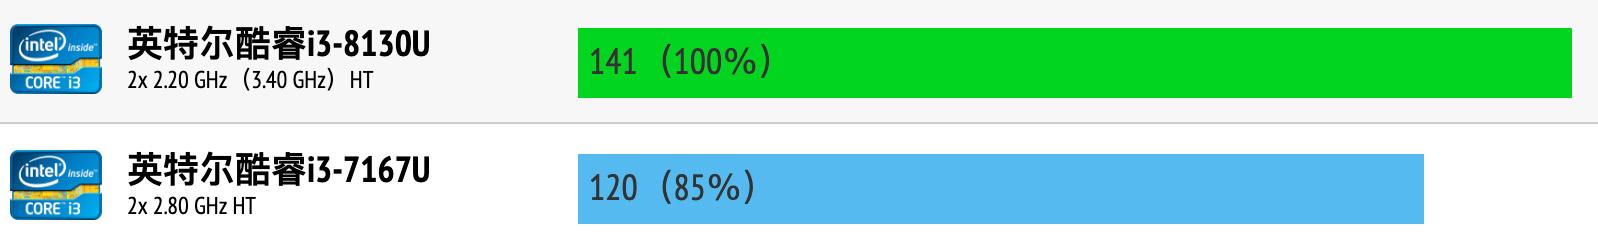 Intel Core i3-8130U和i3-7167U性能跑分对比评测